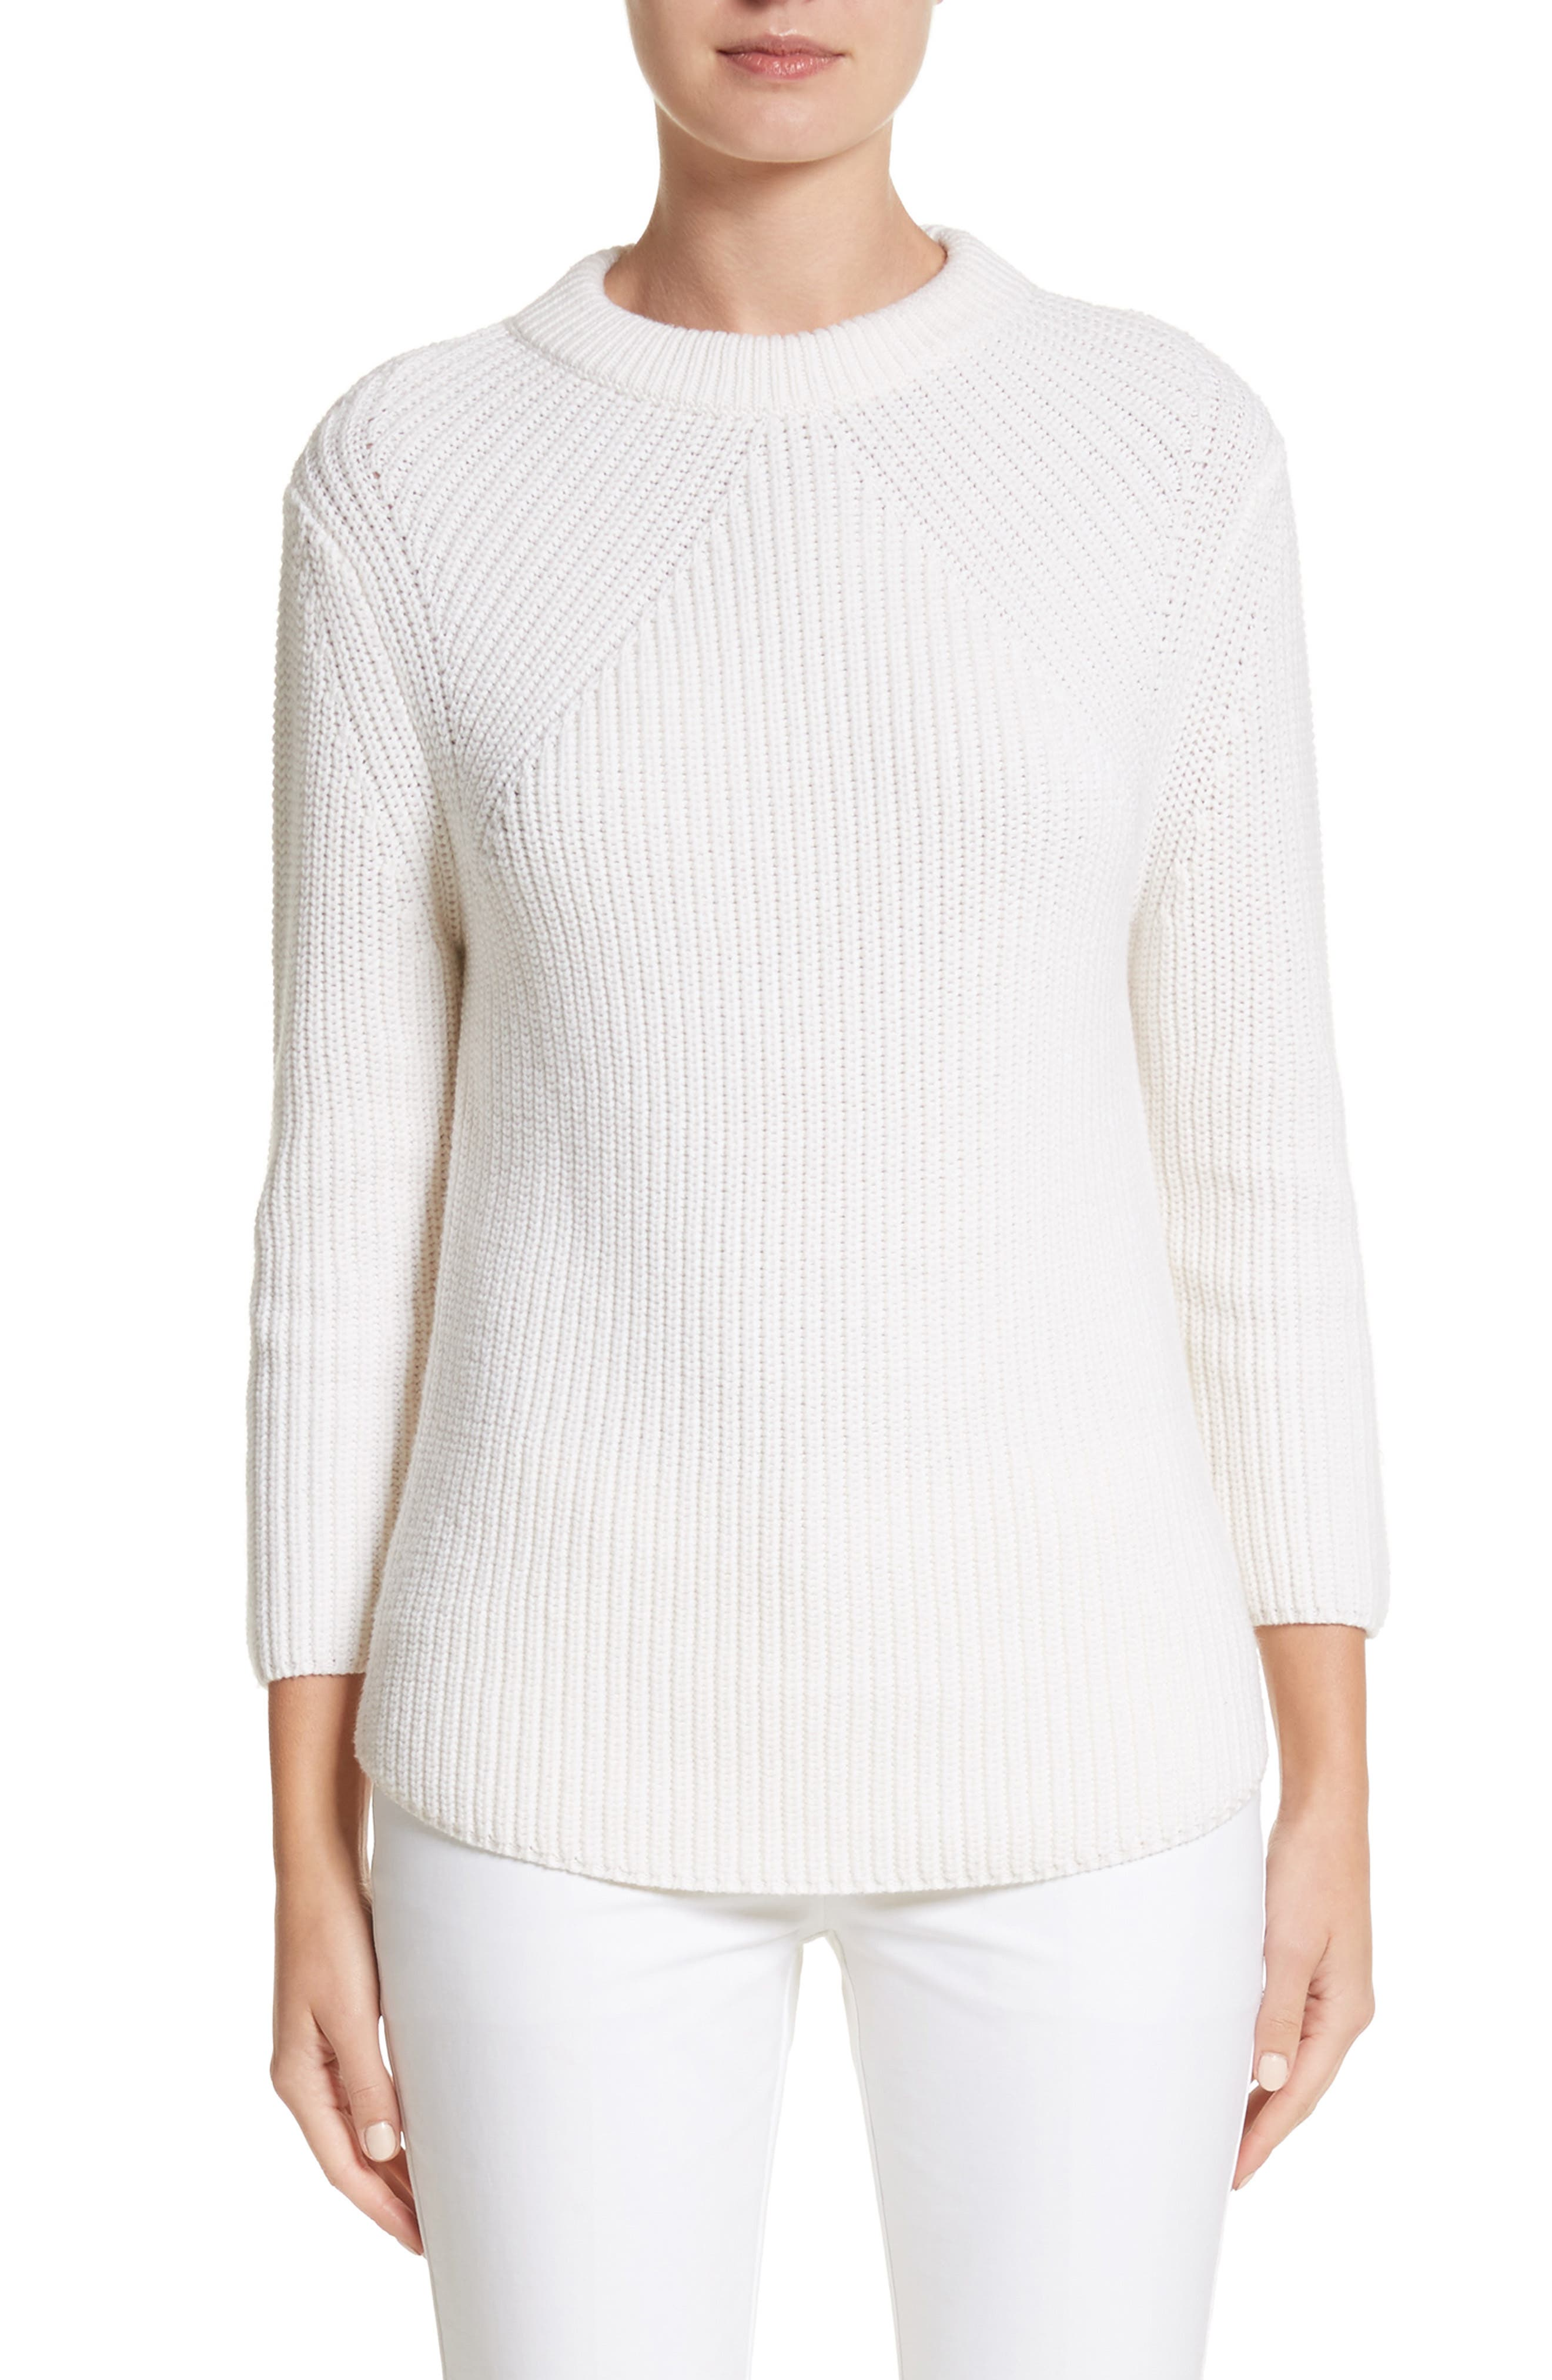 Main Image - Michael Kors Merino Wool & Cotton Pullover